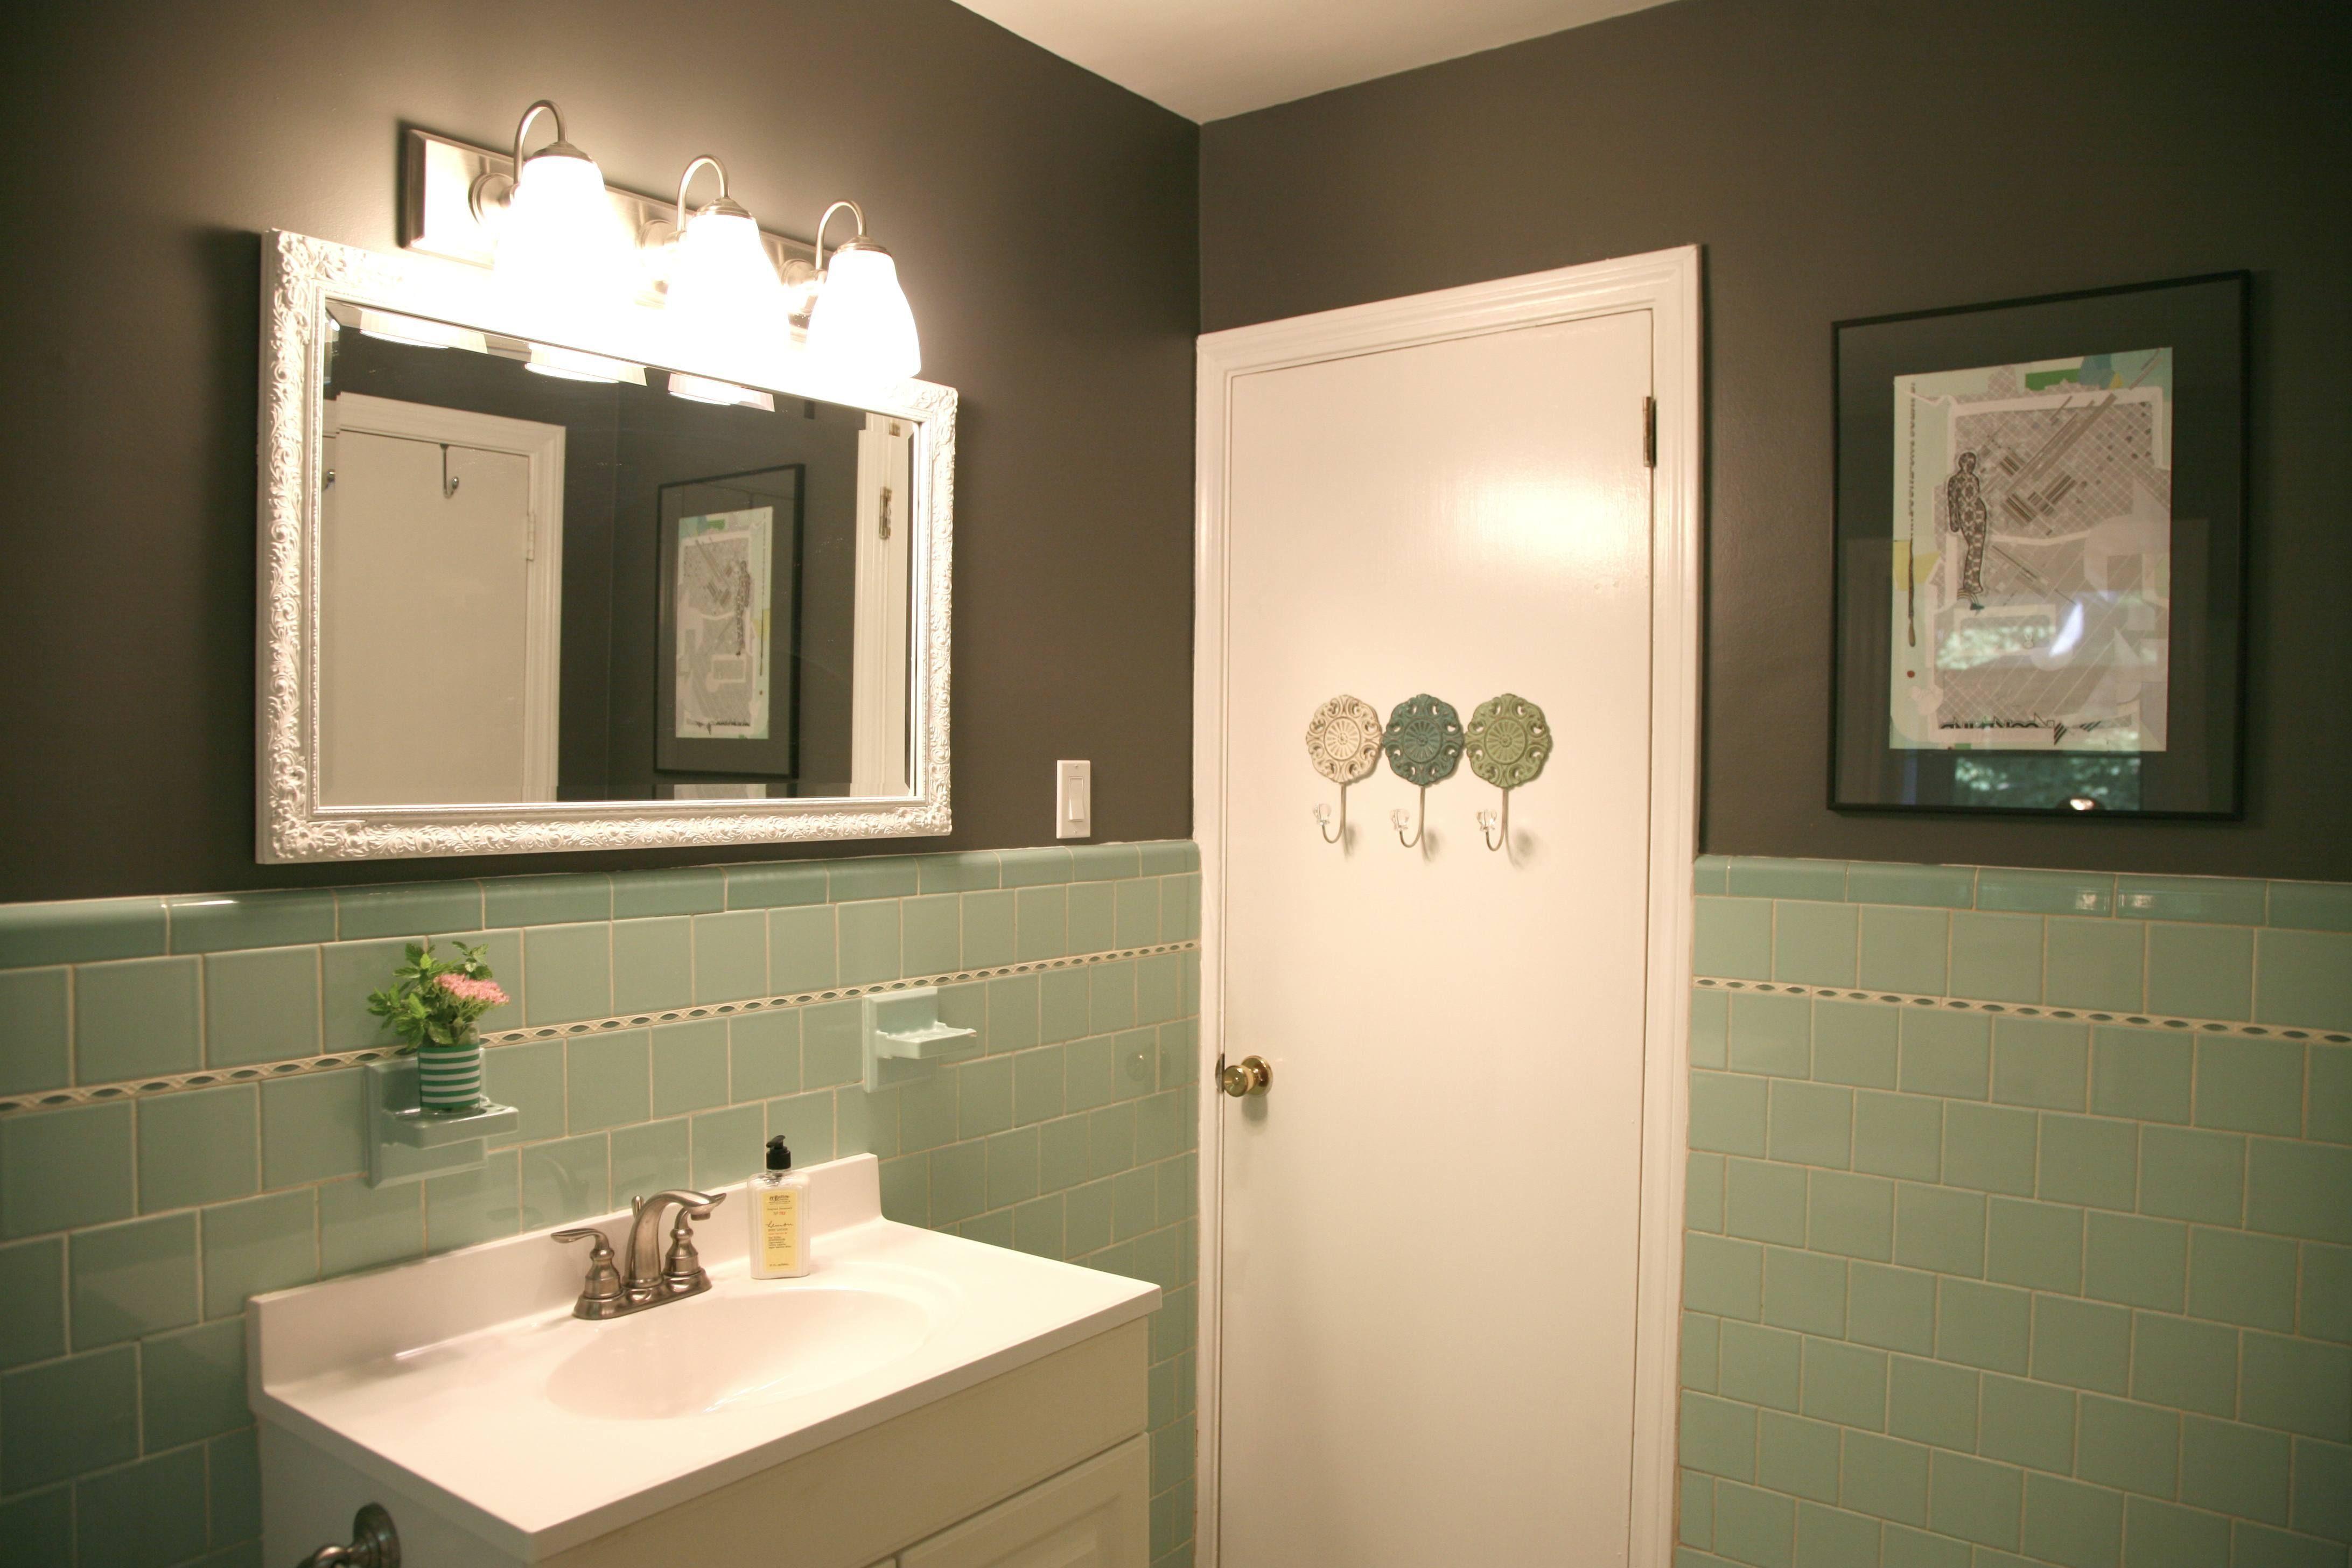 854769204255060485 In 2020 Seafoam Green Bathroom Brown